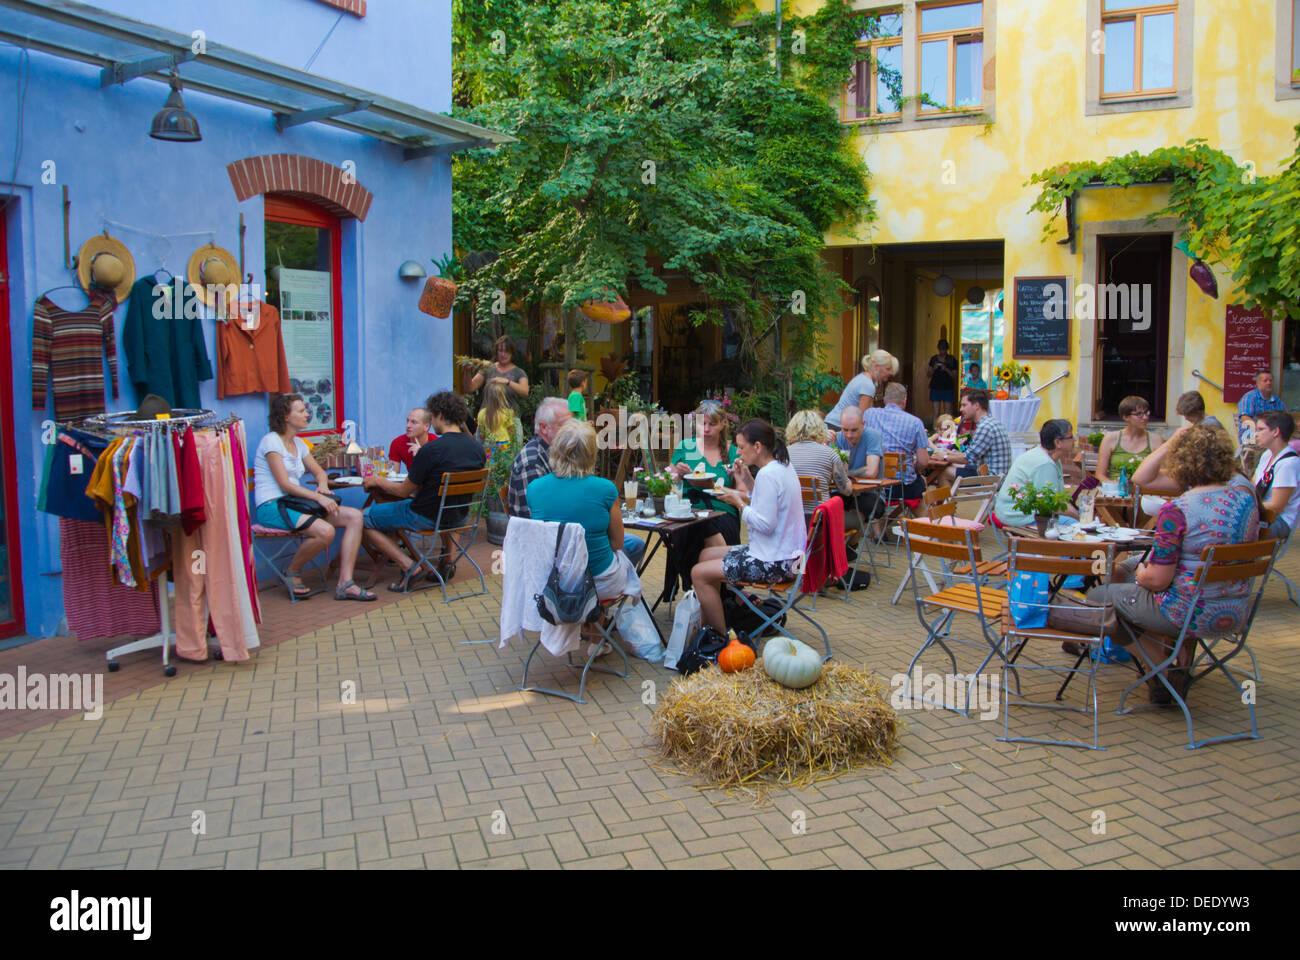 Cafe Restaurant Terrassen Kunsthofpassage Hof Neustadt Dresden Stadt Deutschland Ostmitteleuropa Stockbild